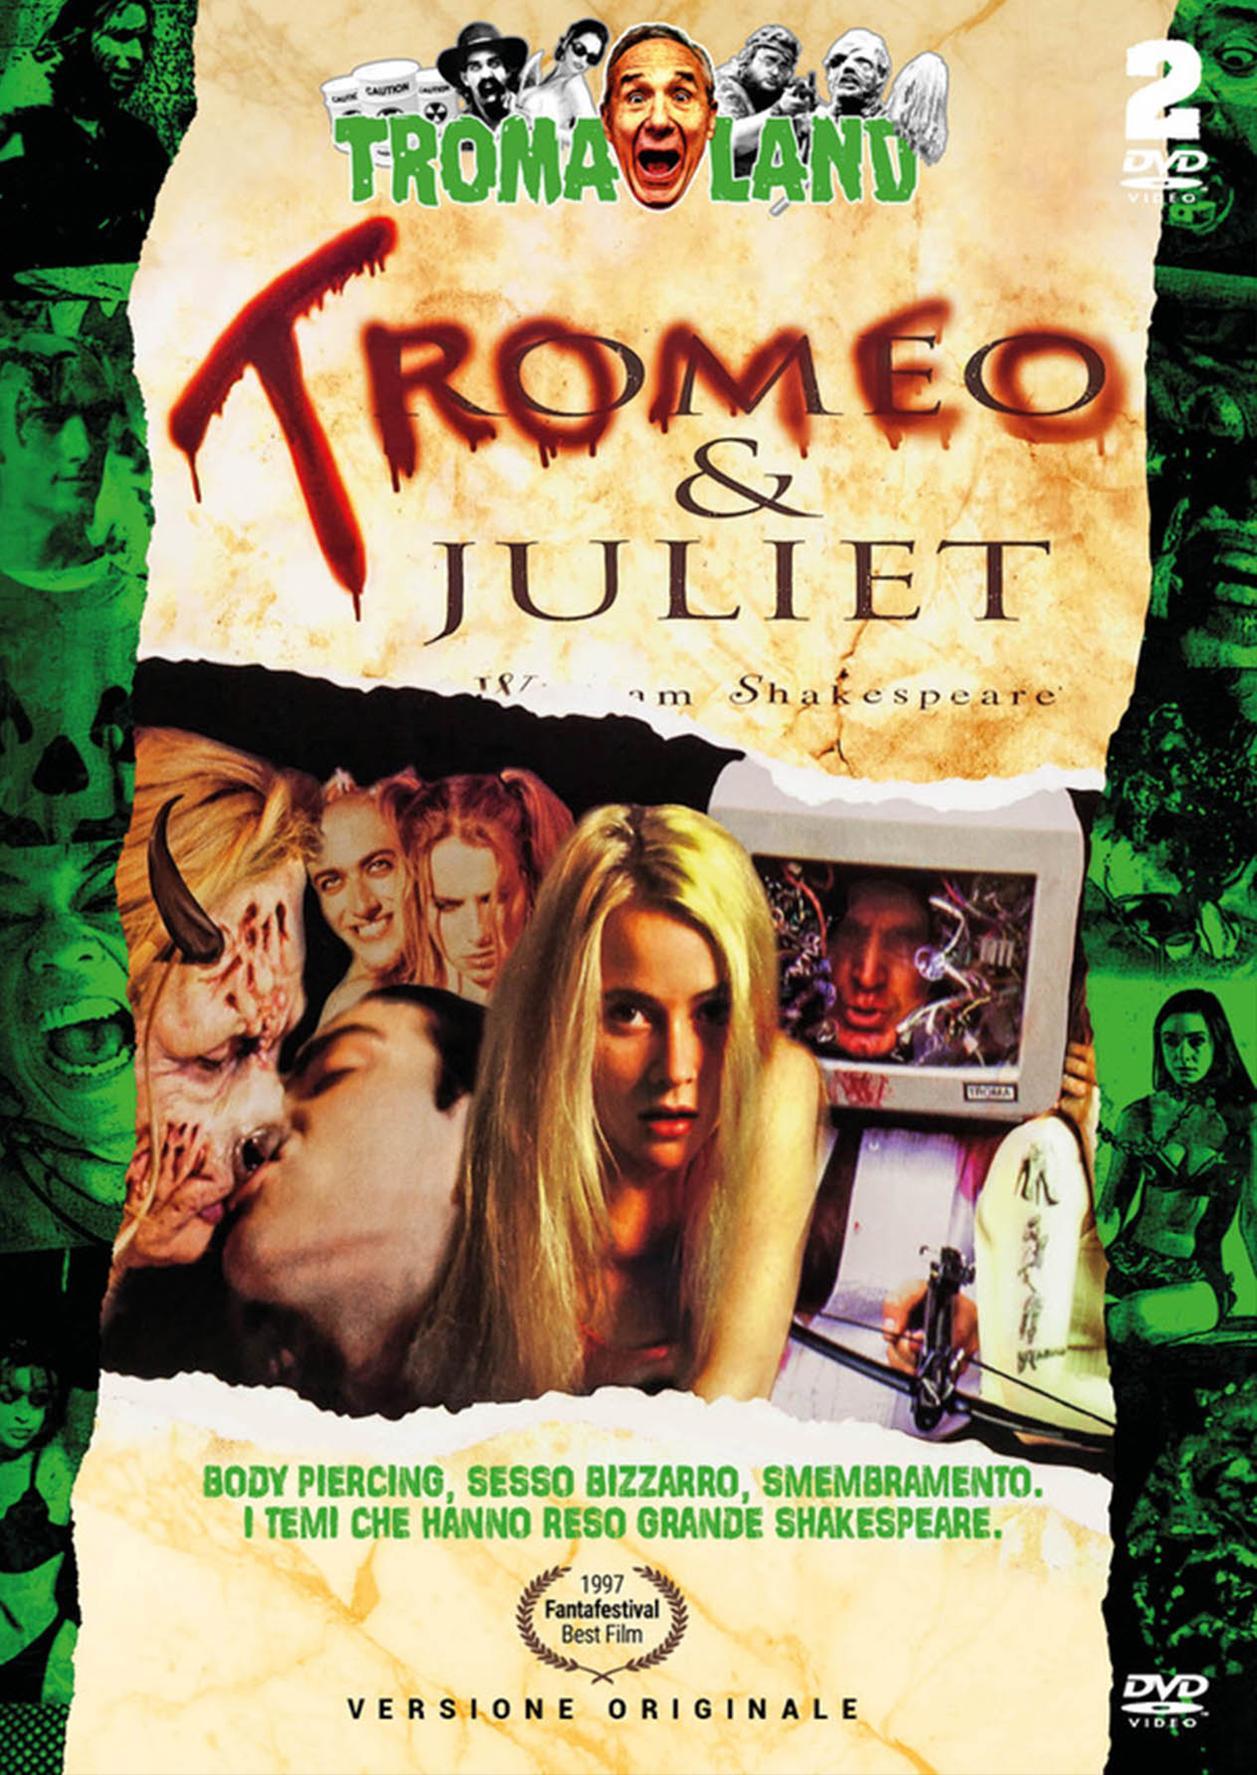 COF.TROMEO & JULIET (2 DVD) (DVD)